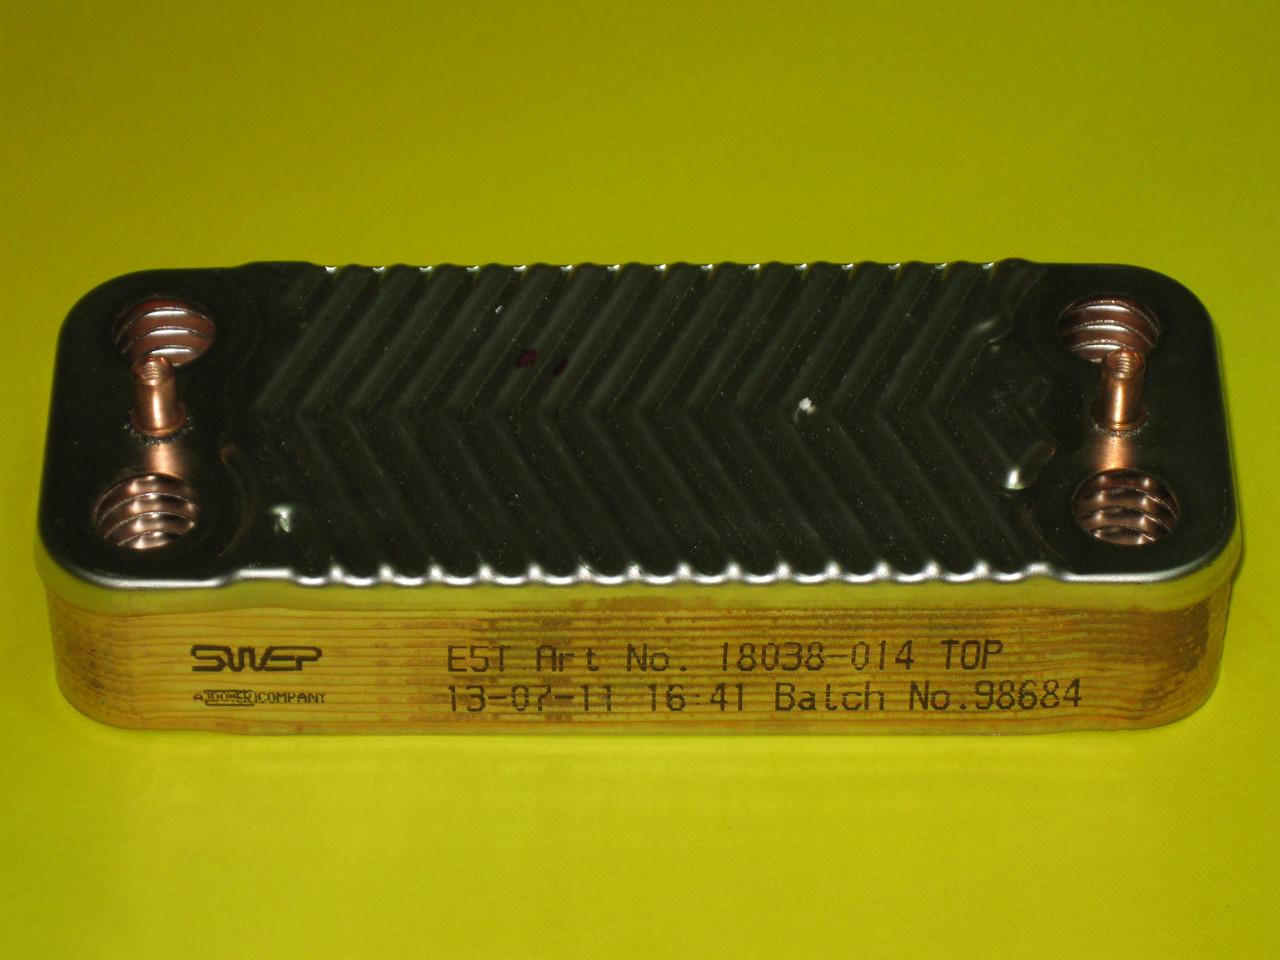 Теплообменник вторичный 1.022220 Immergas Nike Mini 24 kw, Eolo Mini 24 kw, Victrix 24 kw